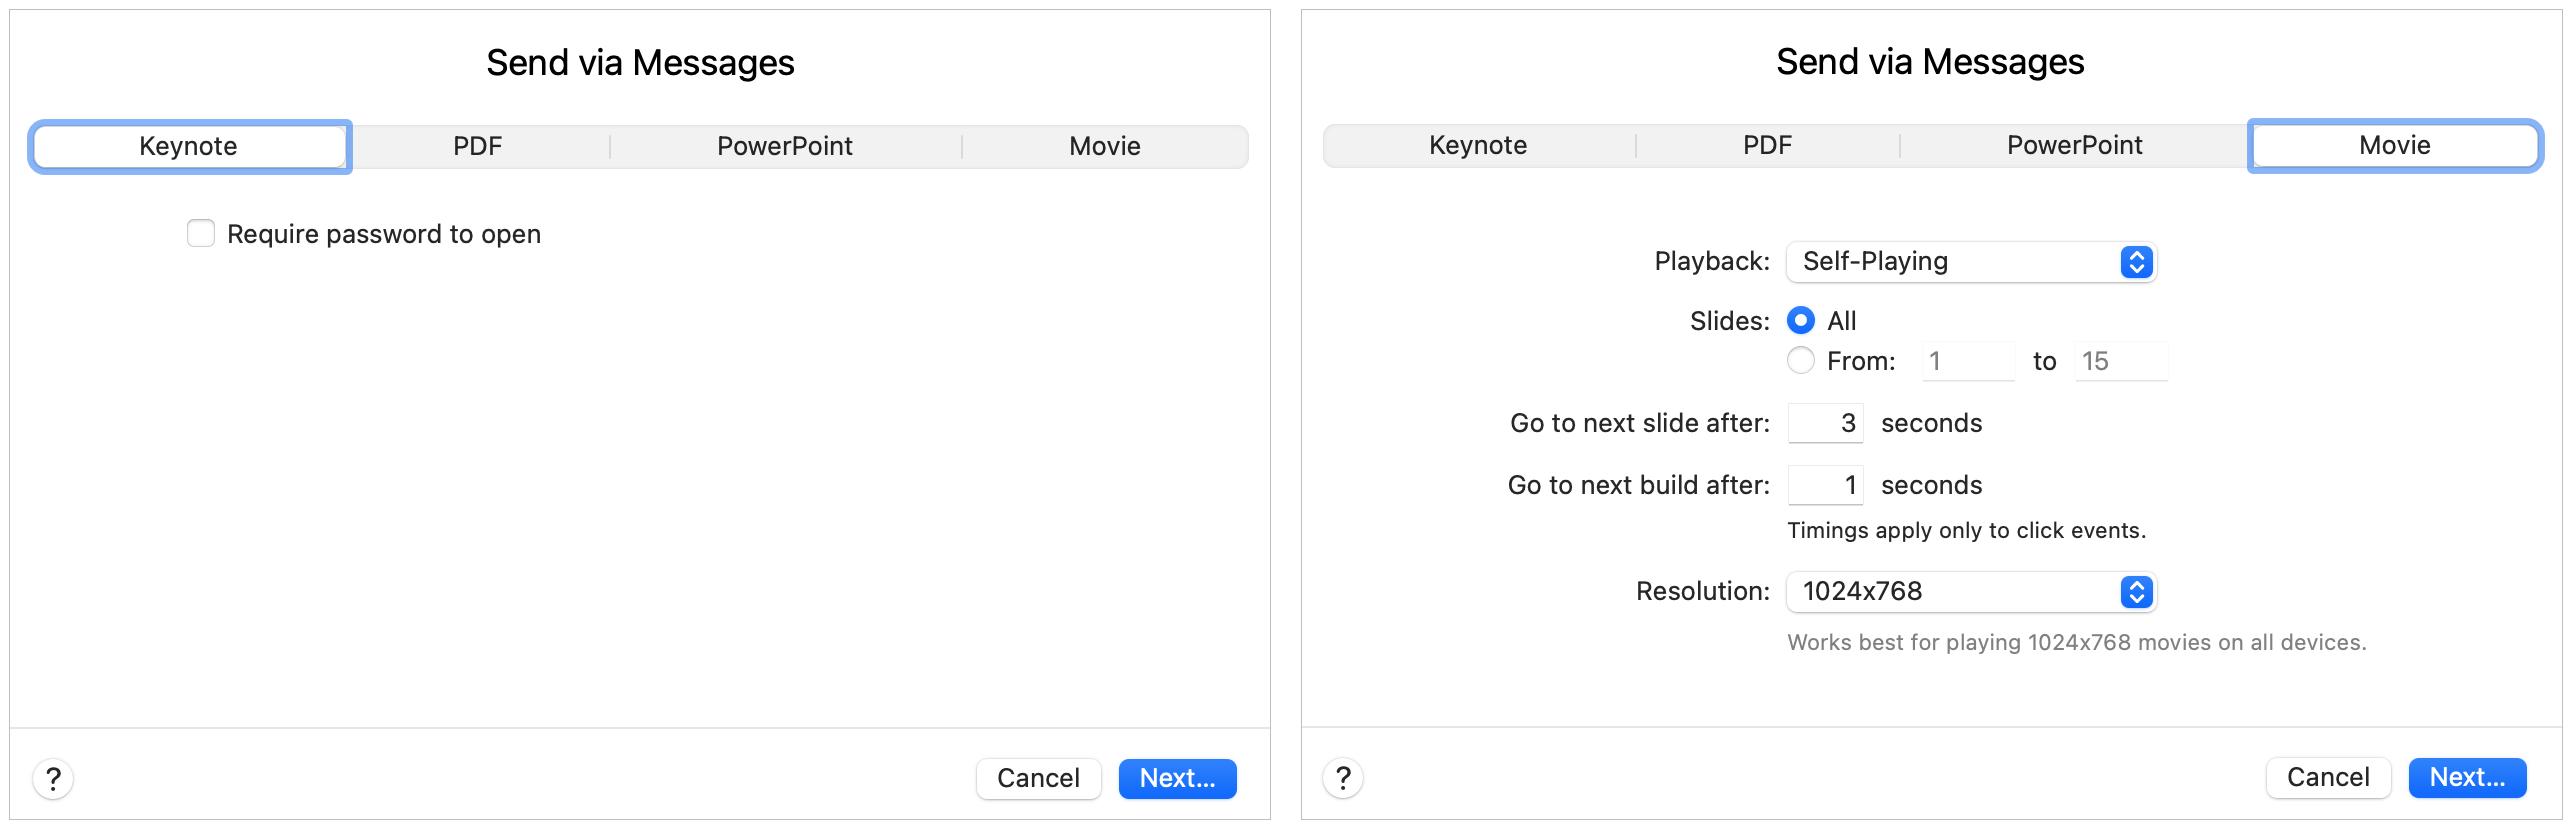 Share Keynote or Movie on Mac